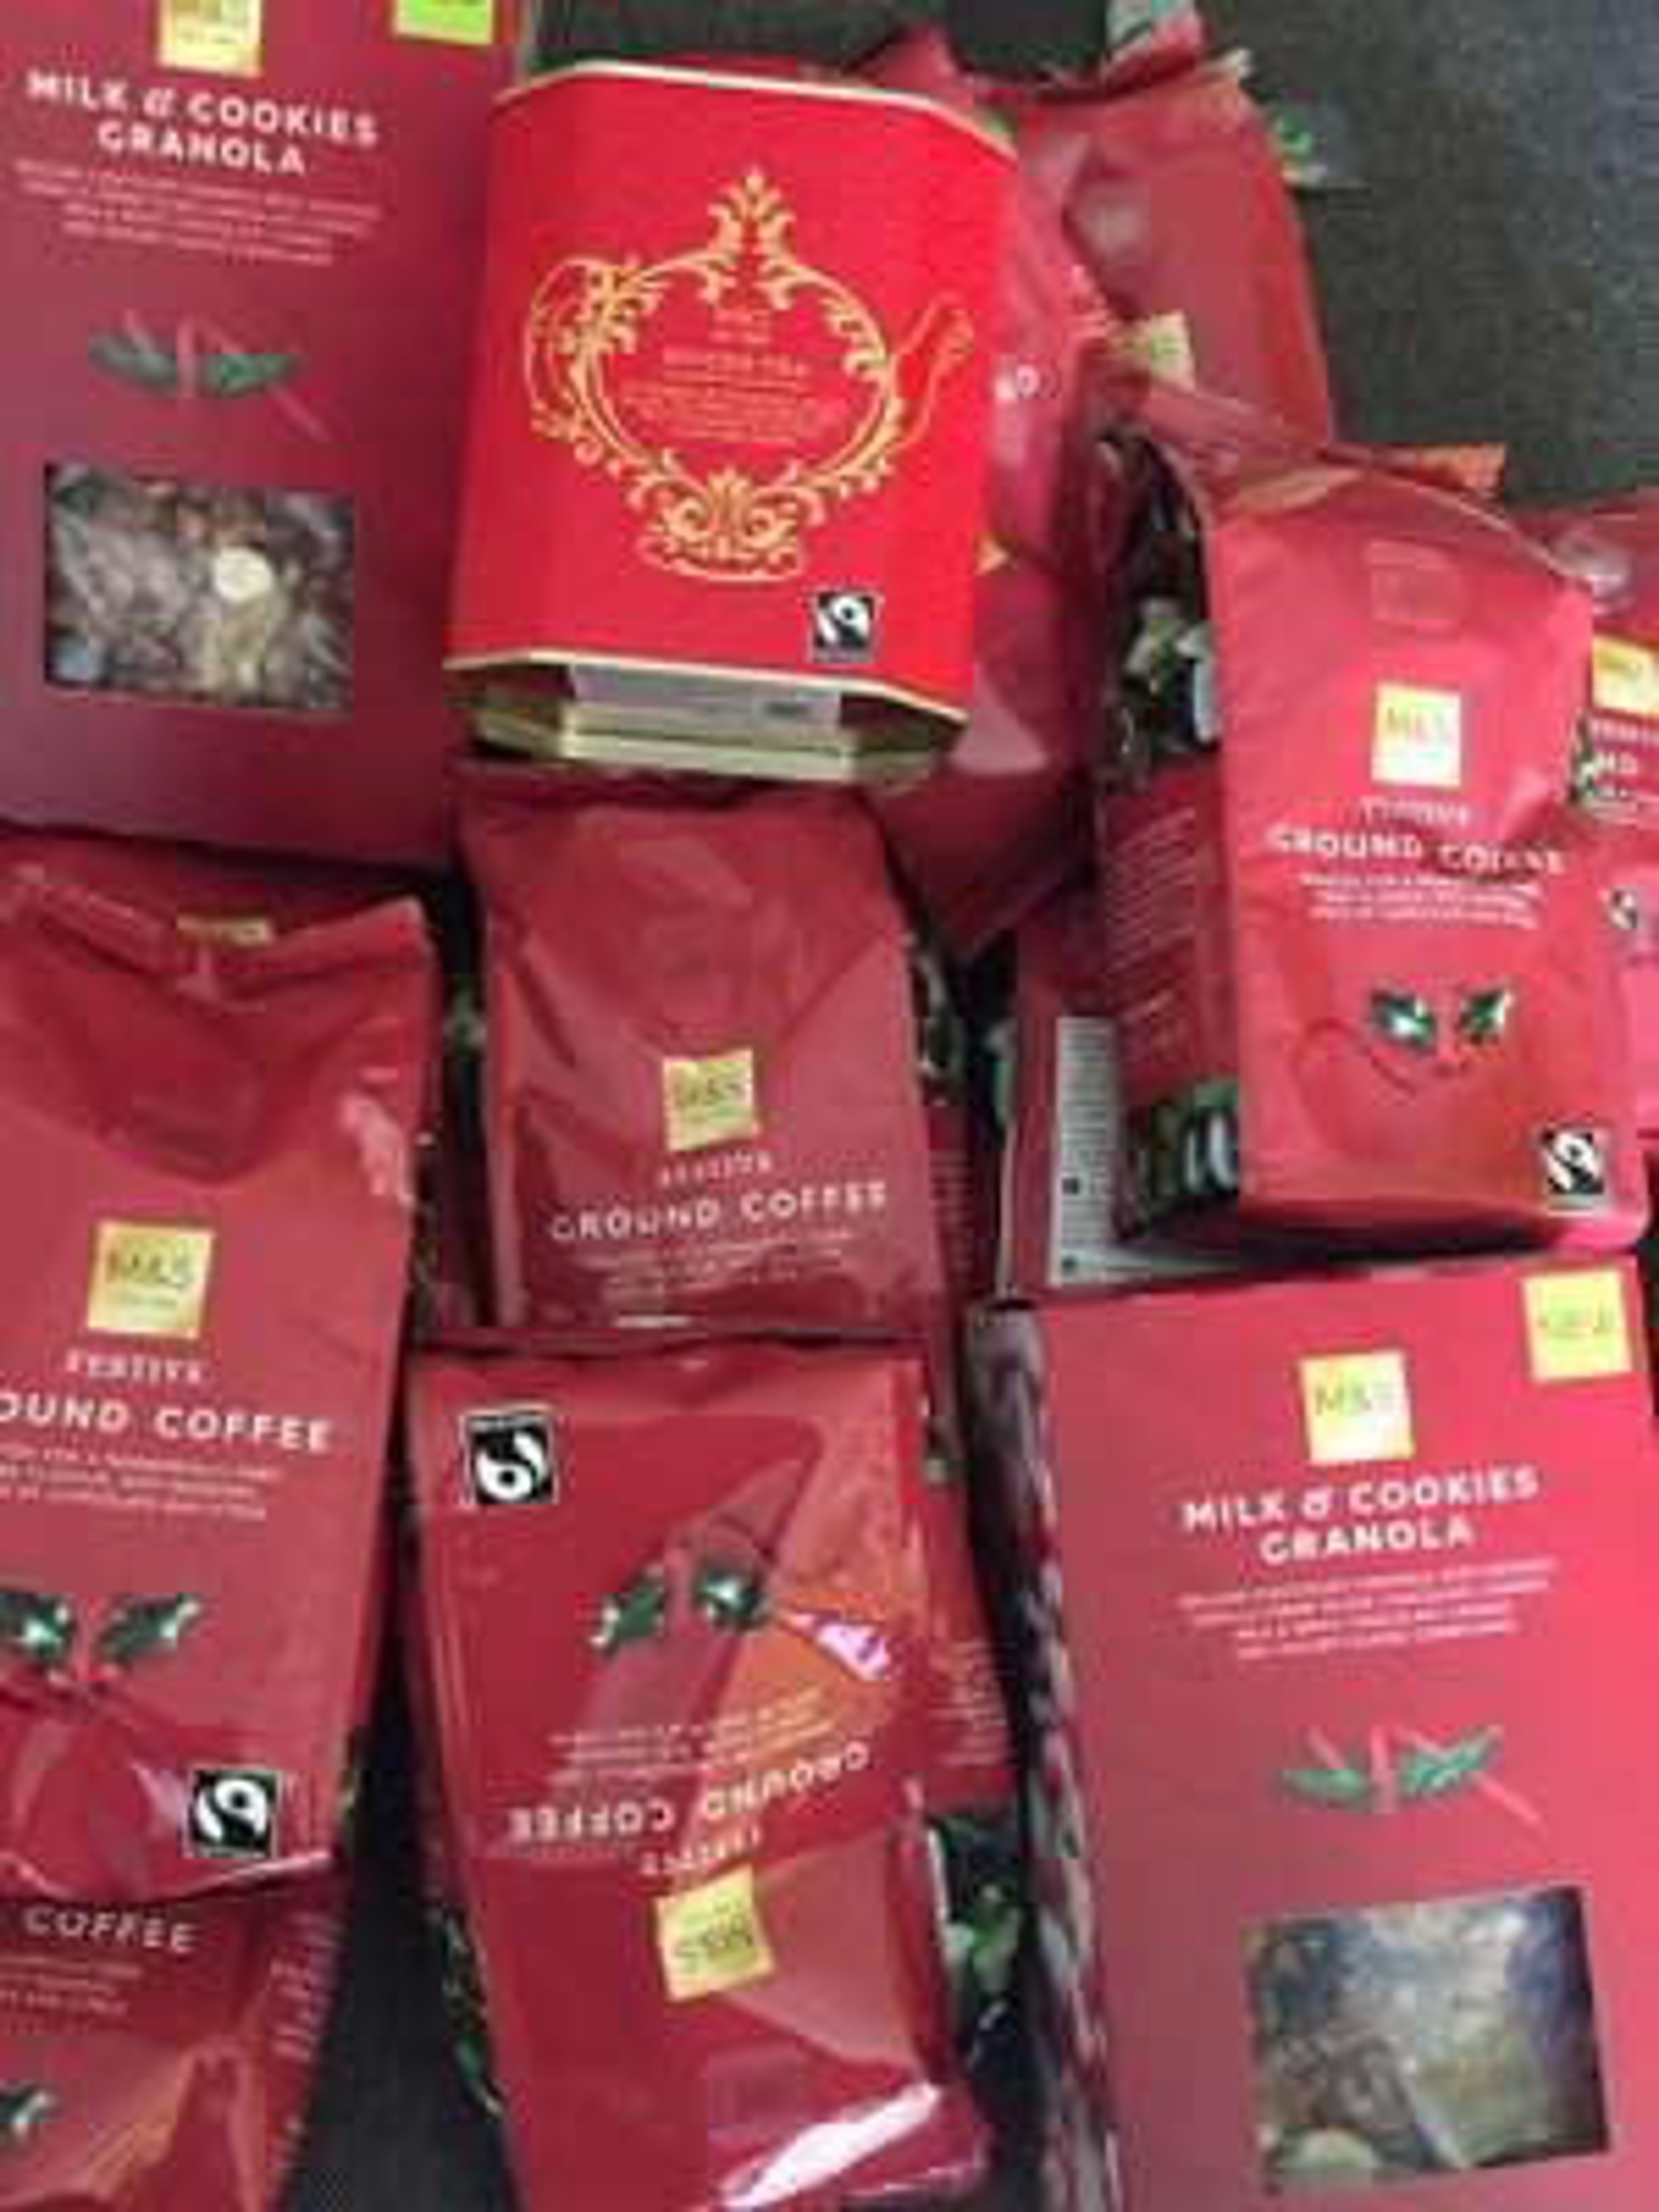 M&S Festive Coffee £1 instore